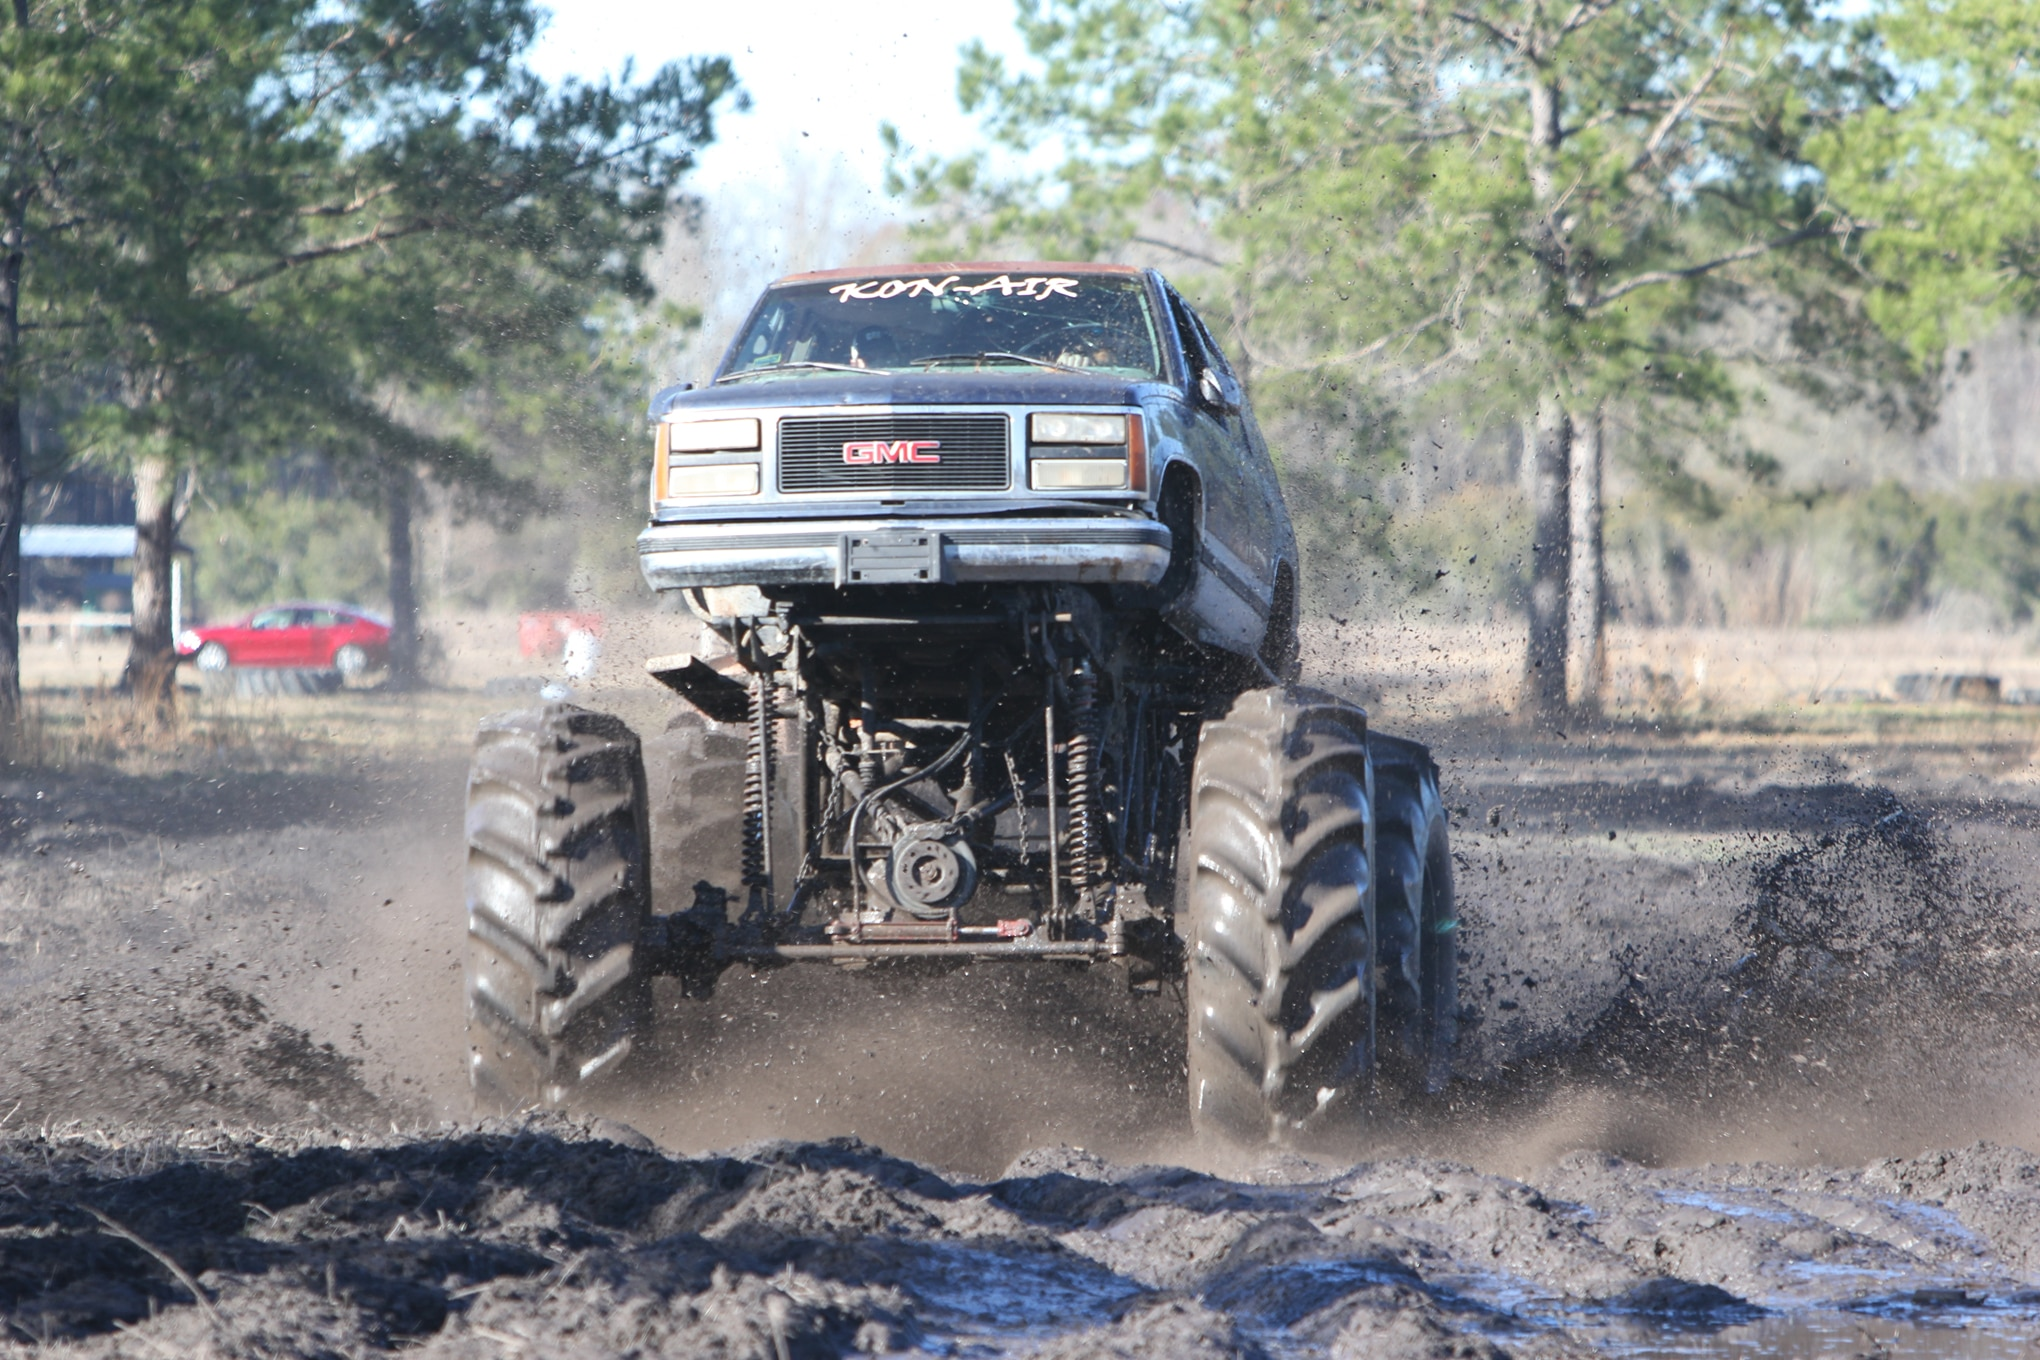 048 south berlin mud ranch 2016